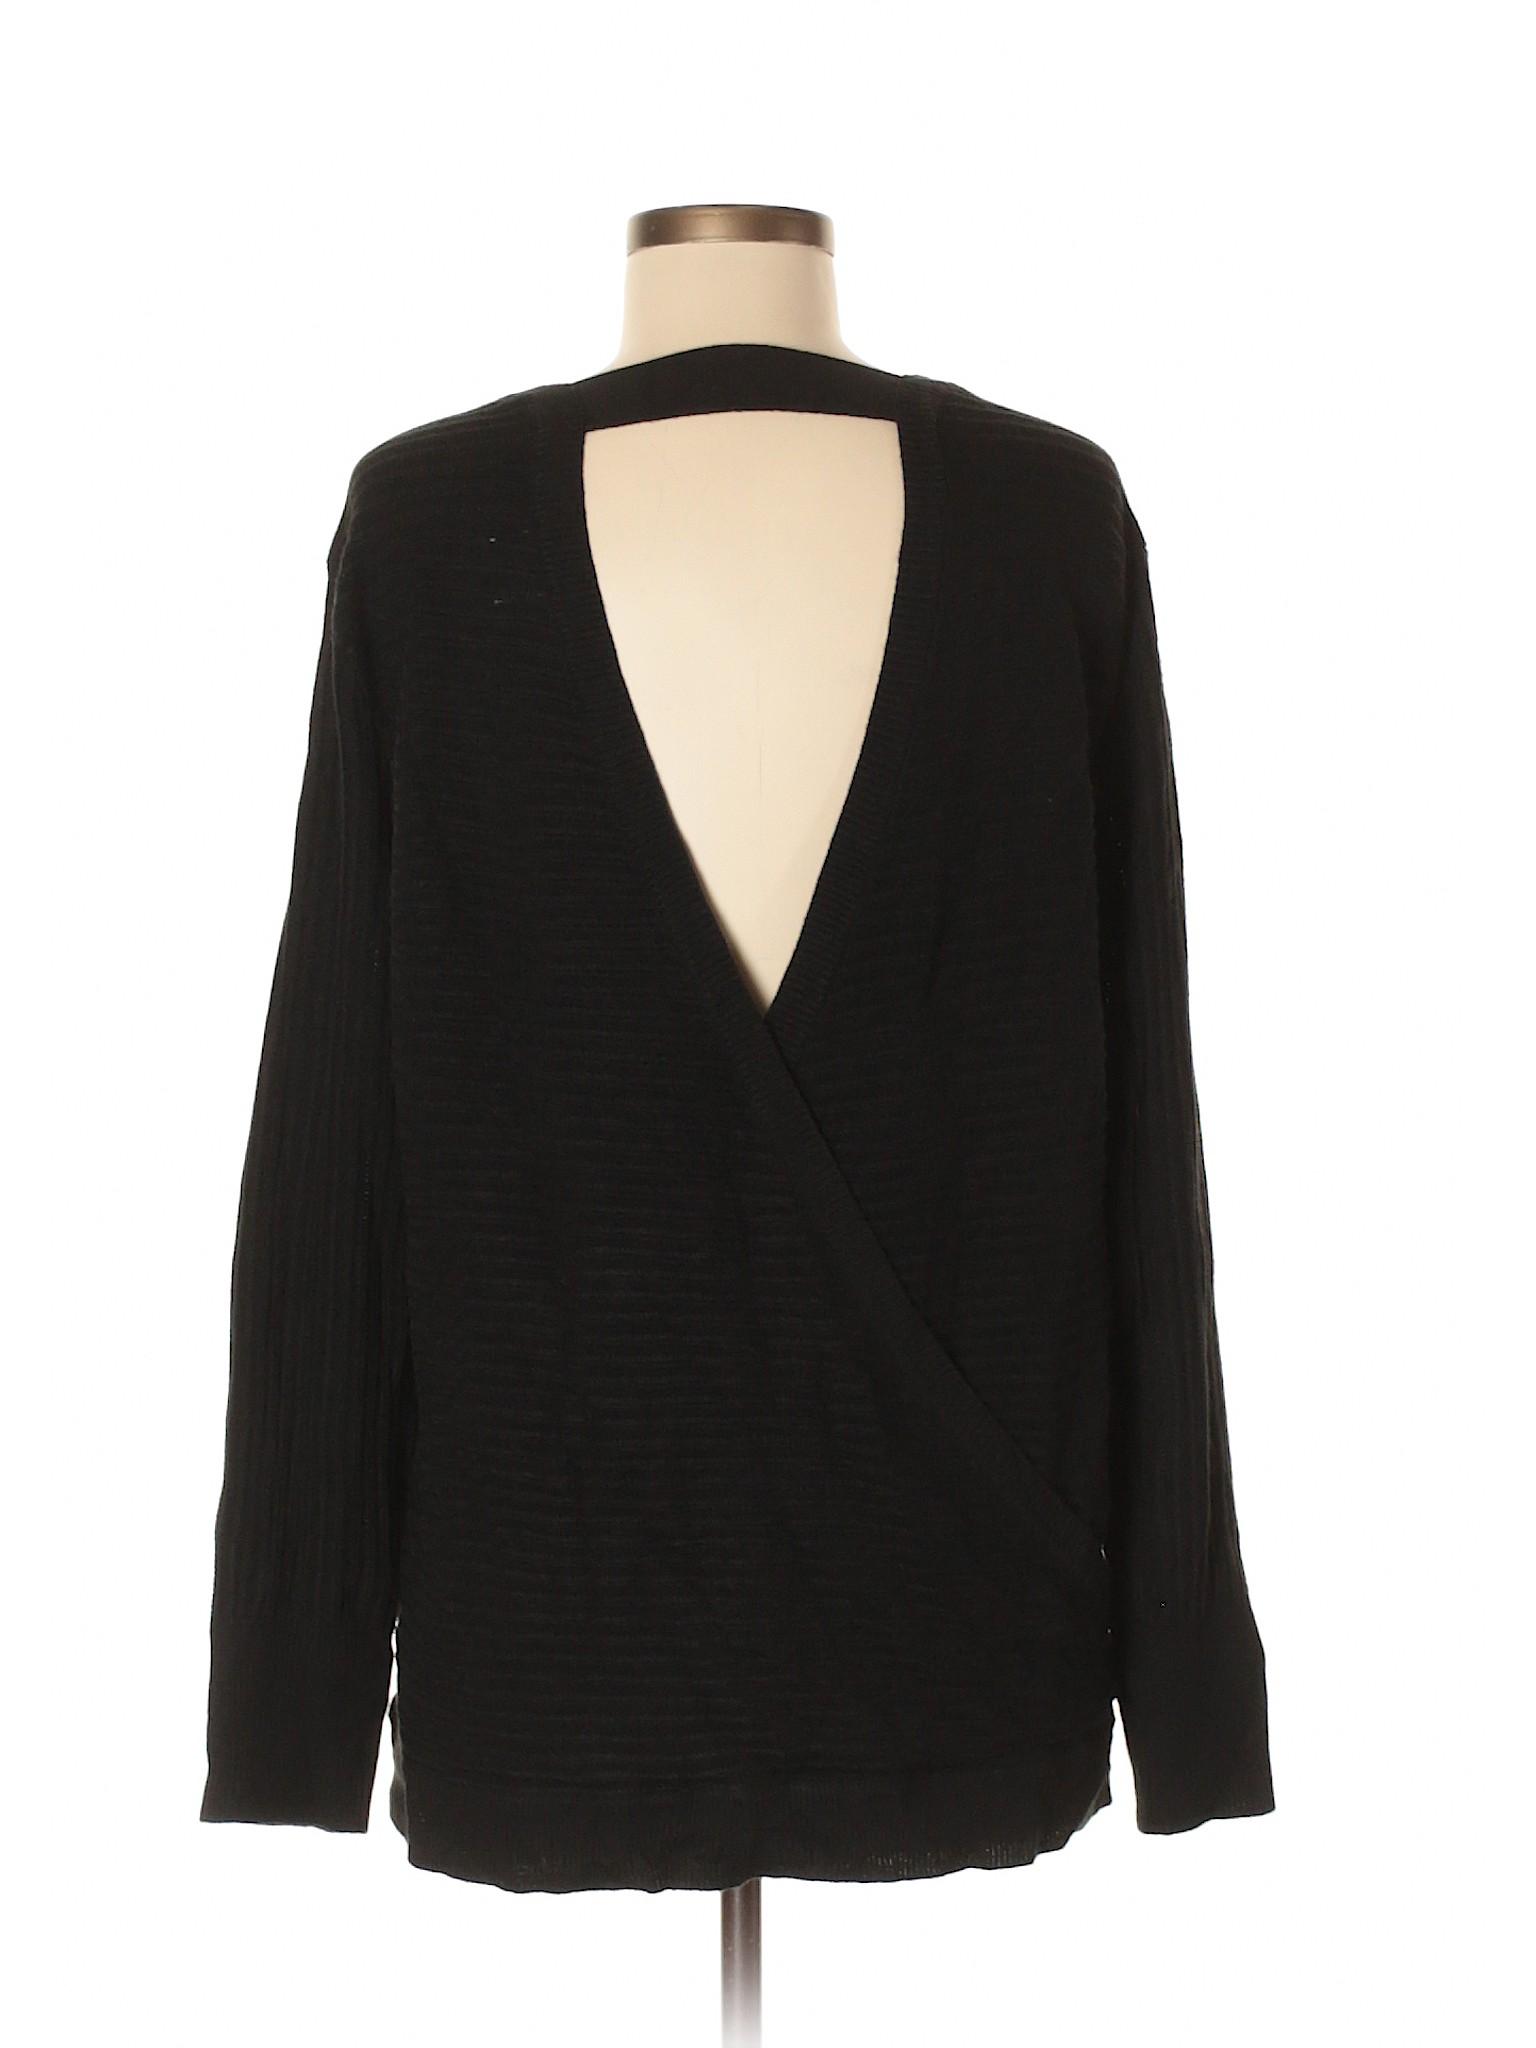 Sweater Company York winter Pullover New amp; Boutique fC7q4